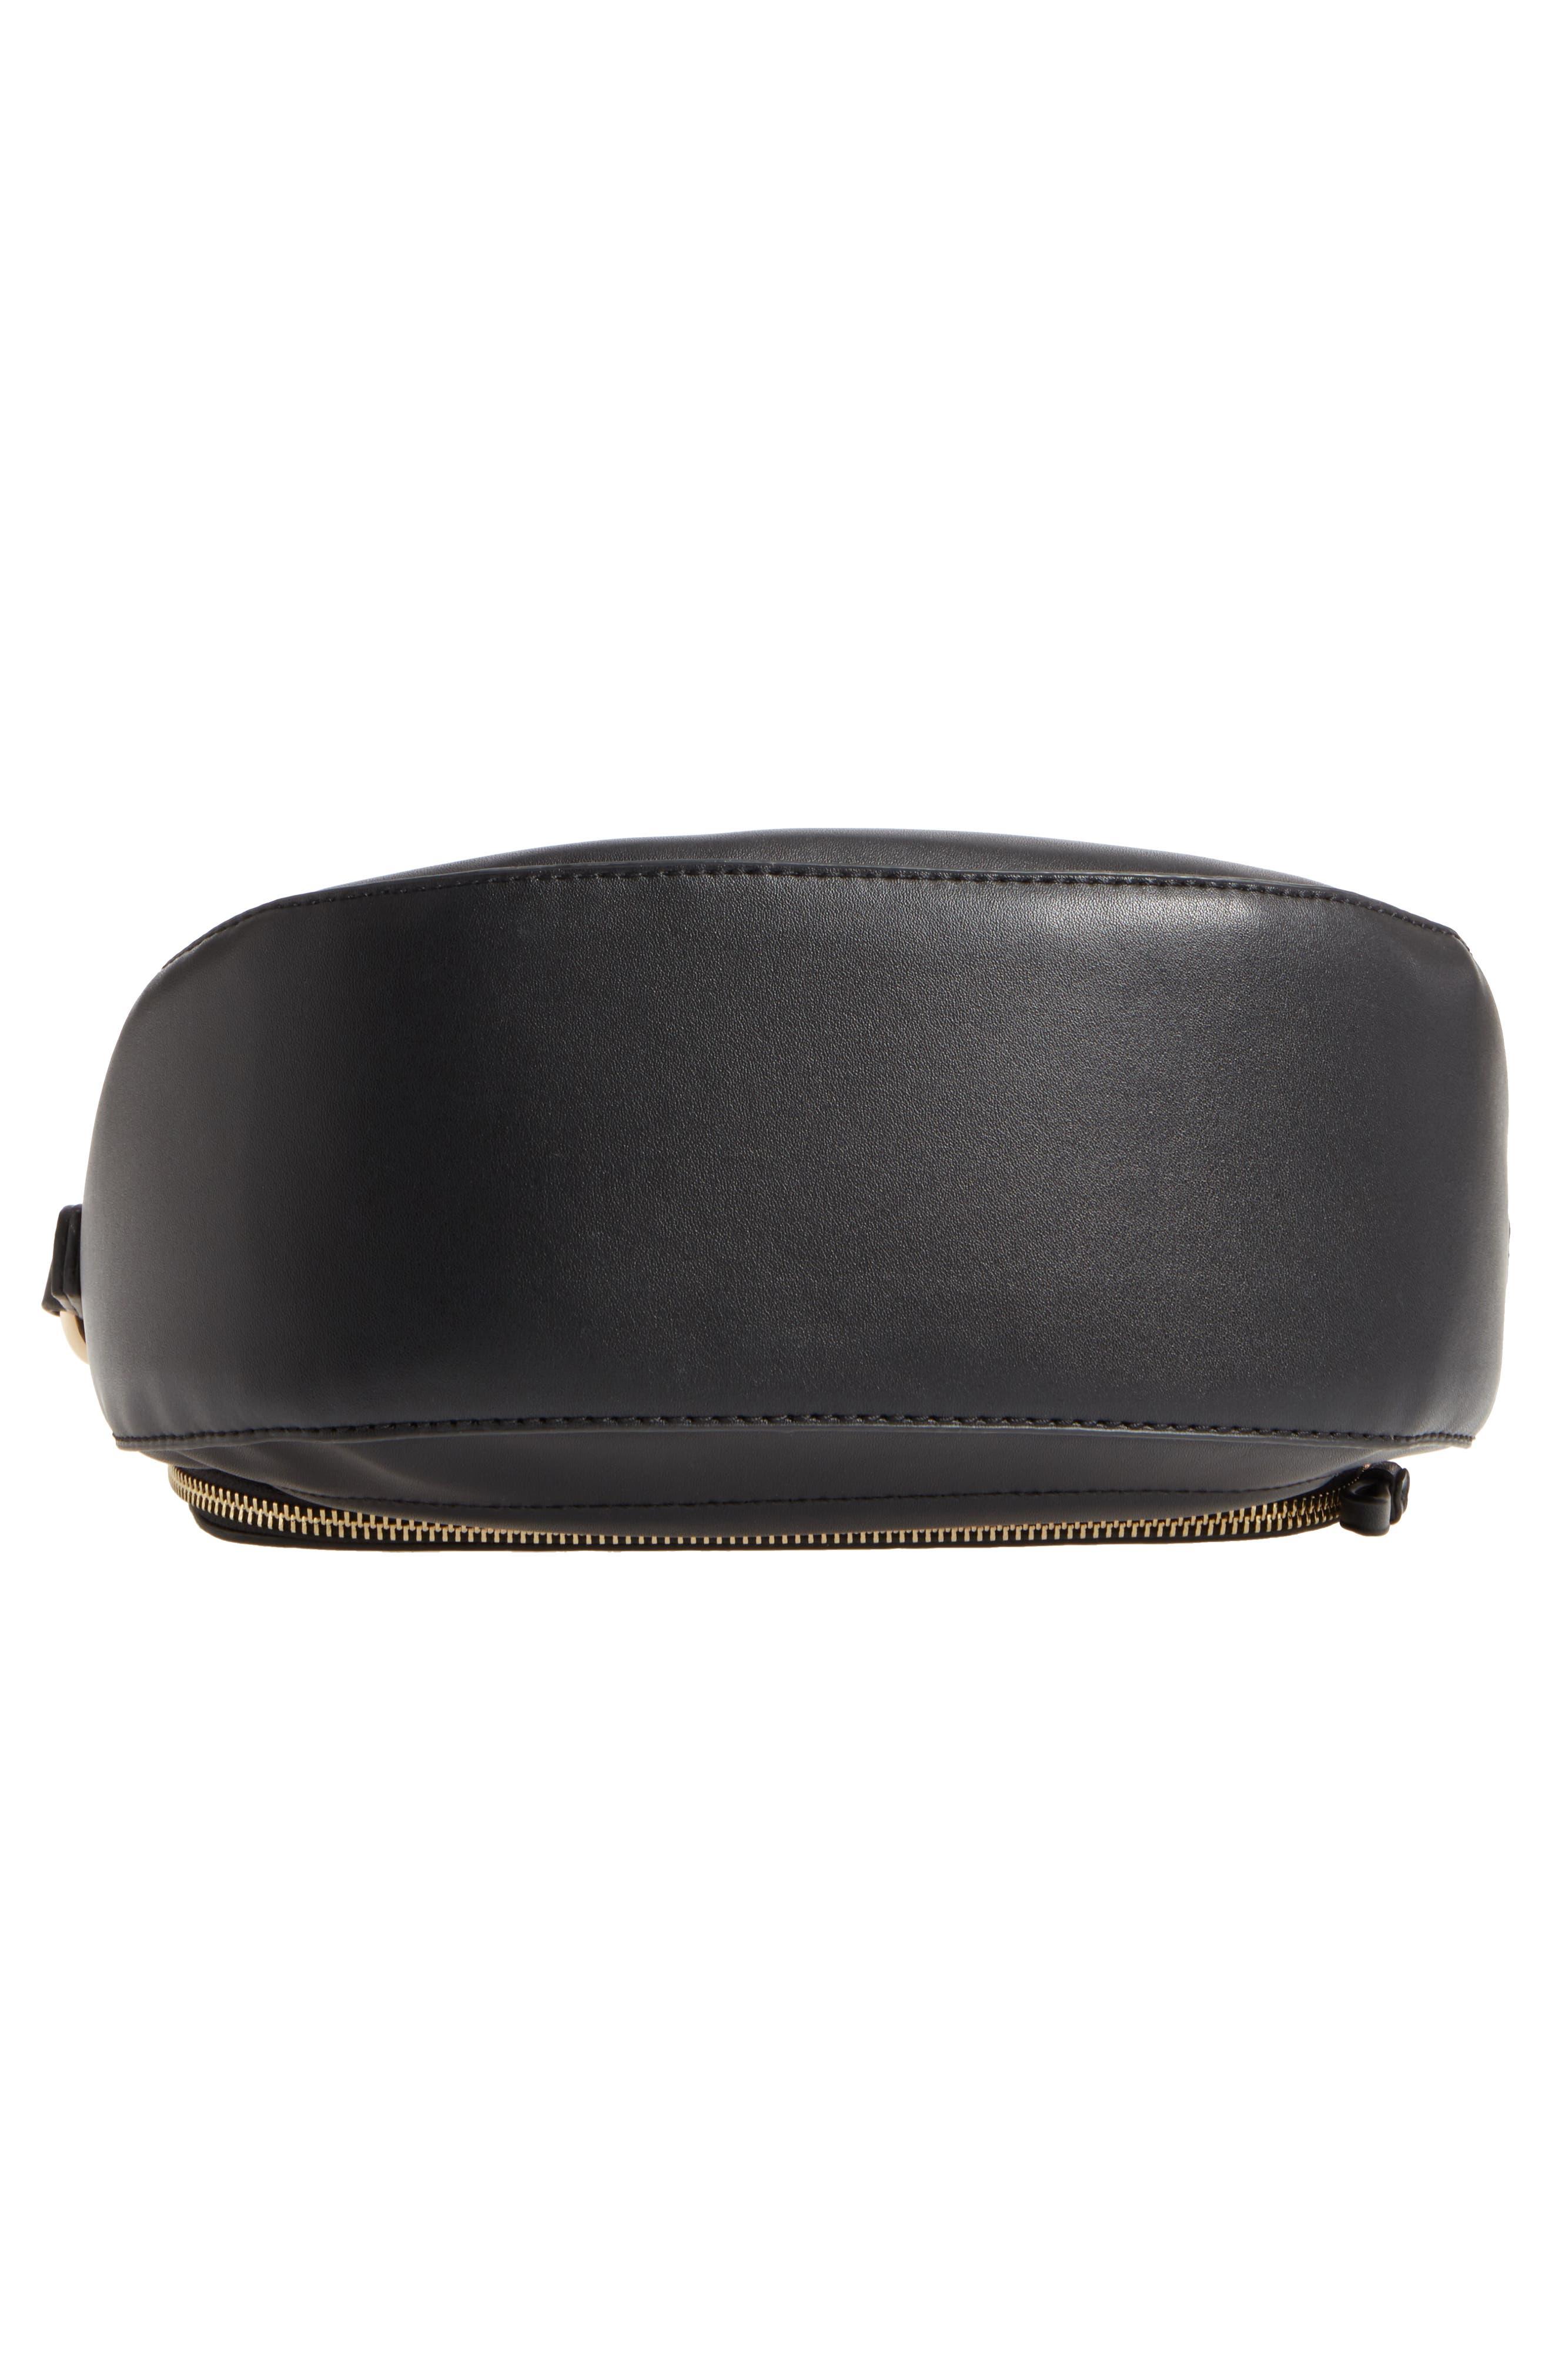 Adden Faux Leather Crossbody Bag,                             Alternate thumbnail 6, color,                             Black